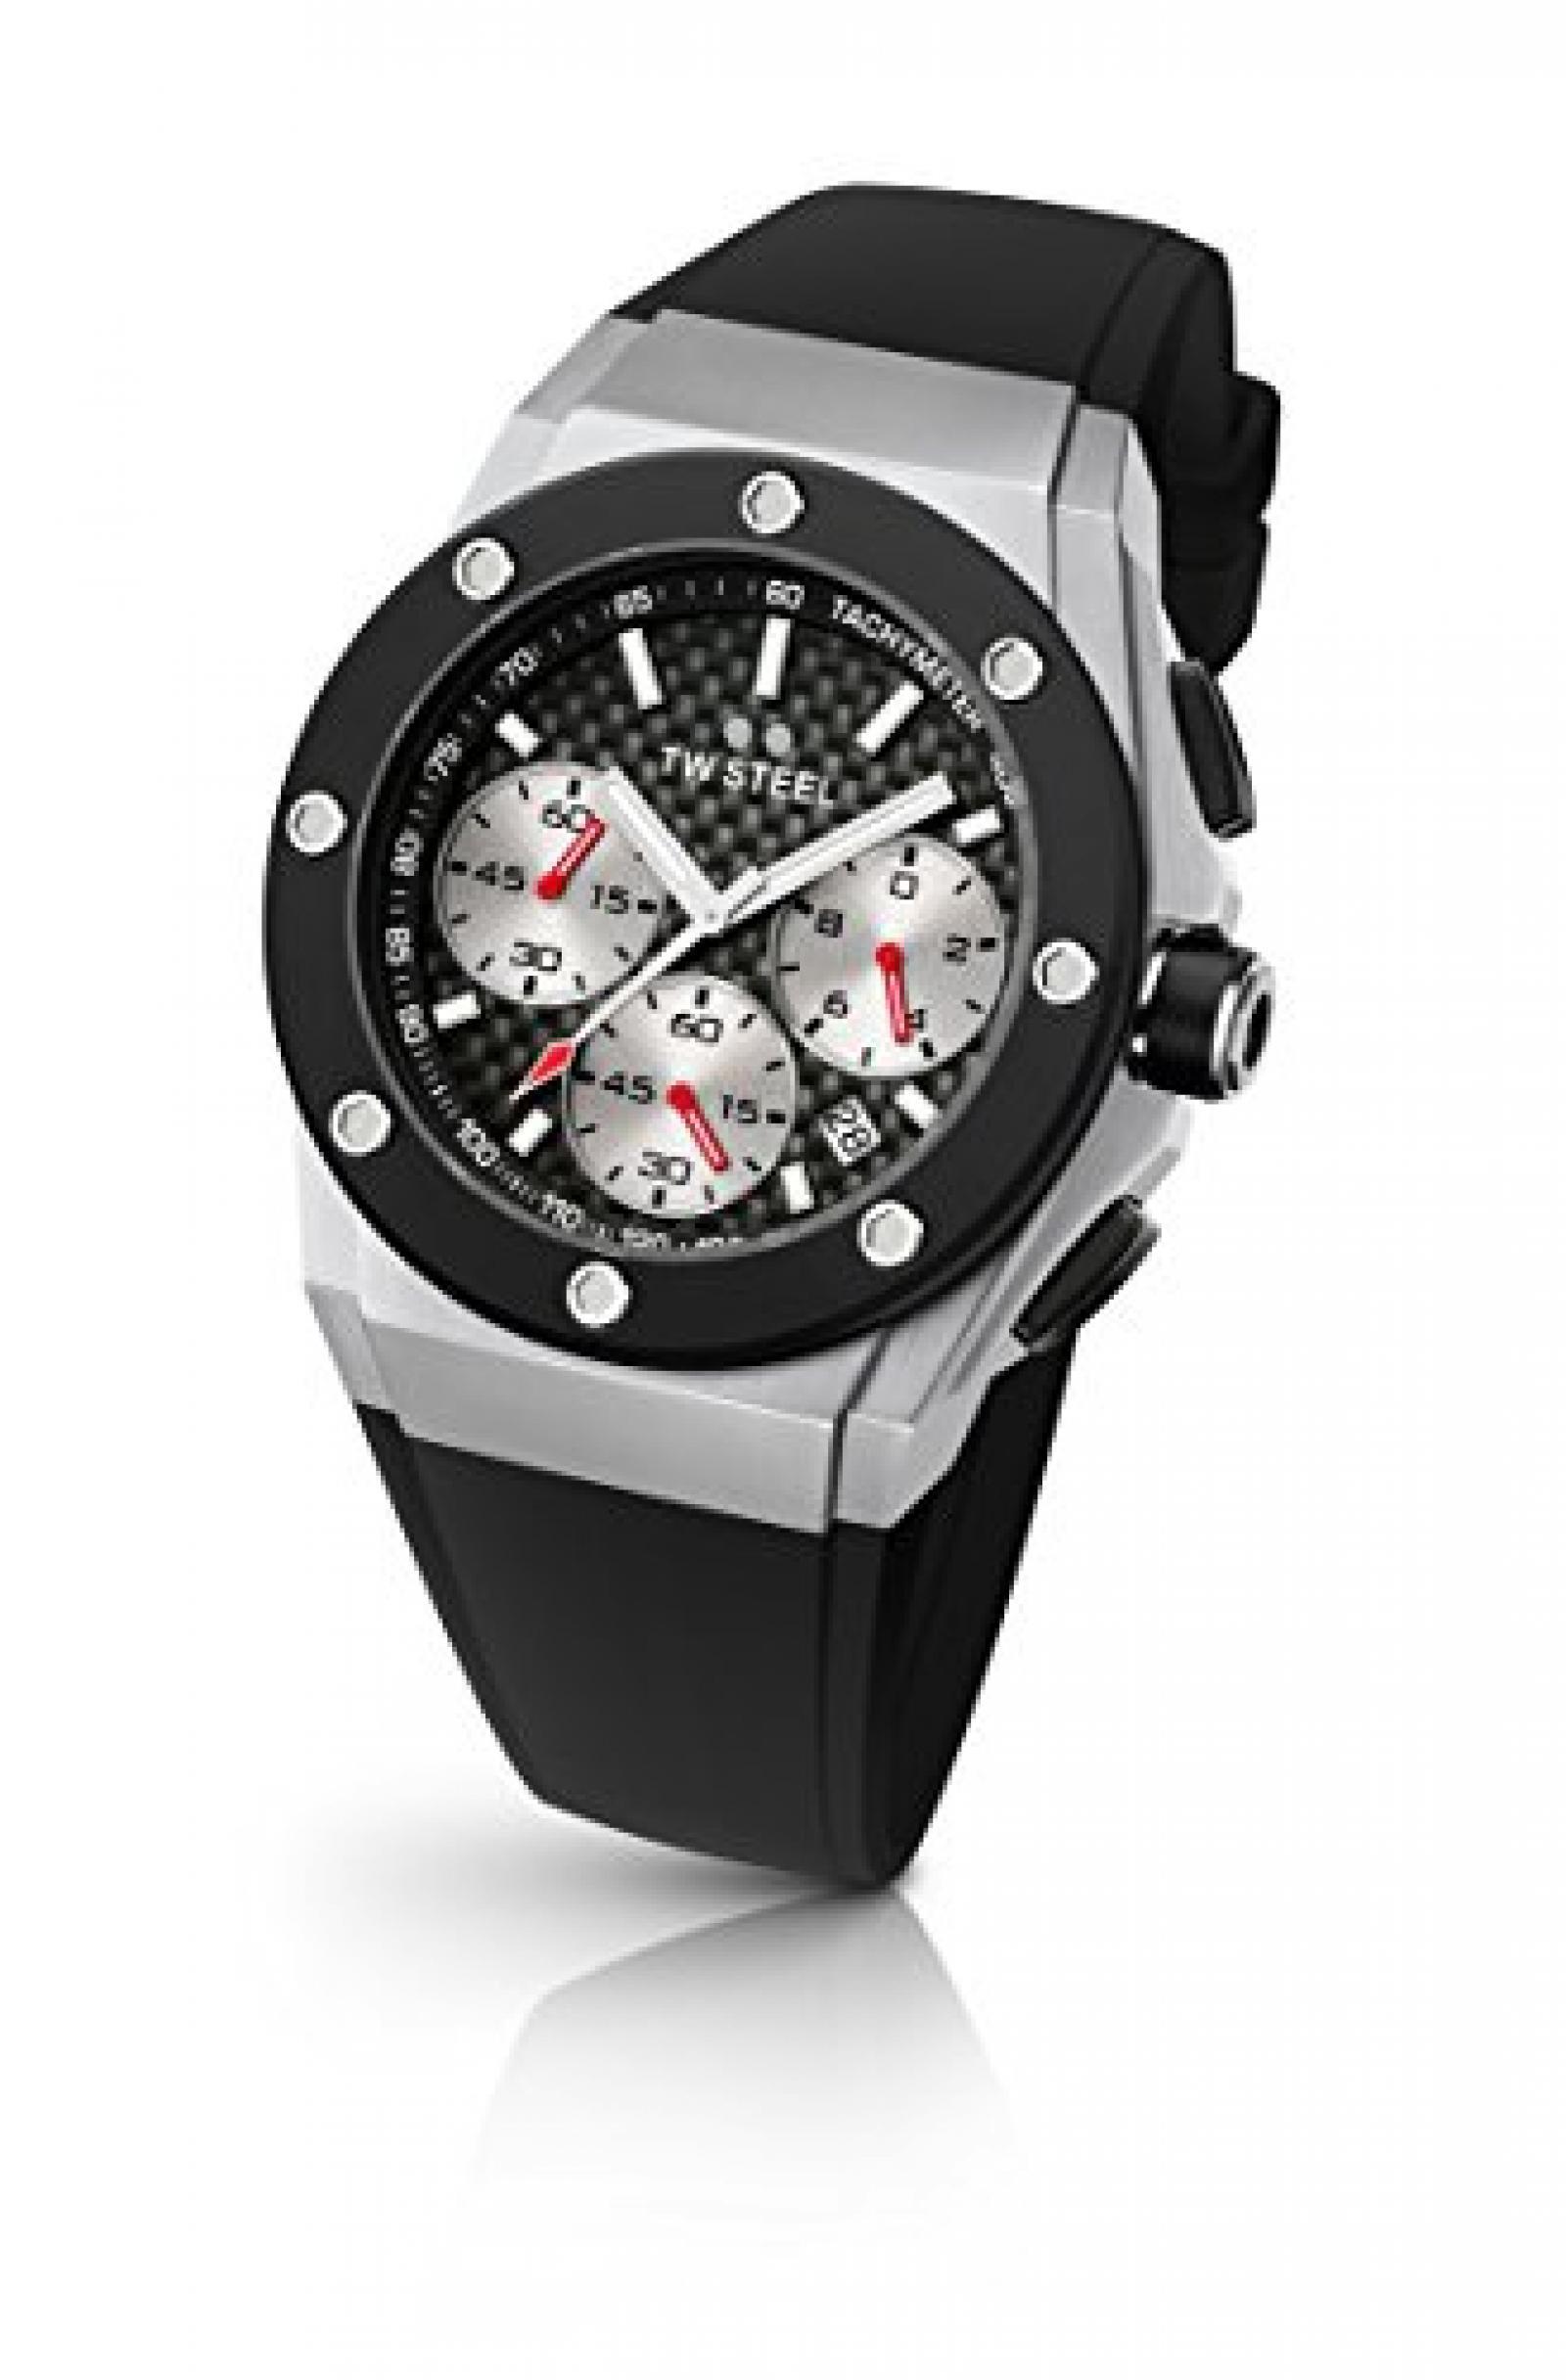 TW Steel Unisex-Armbanduhr CEO Tech David Coulthard Edition Chronograph Silikon Schwarz CE4019